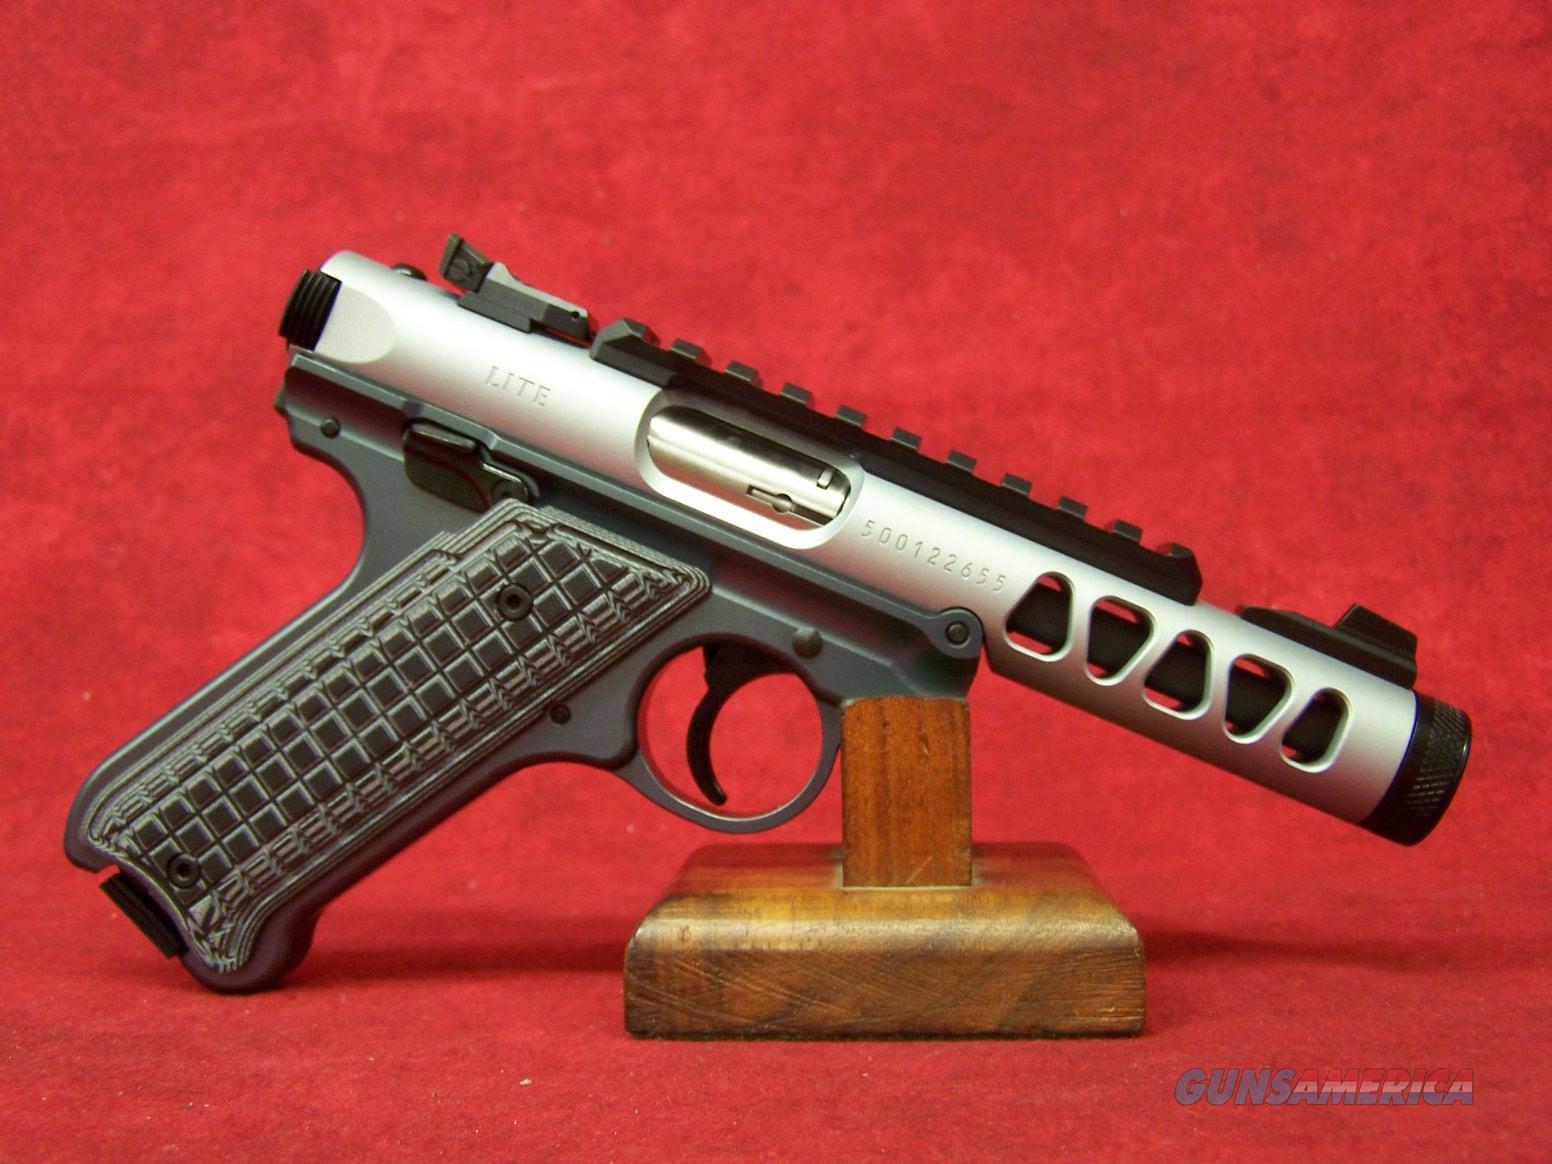 "Ruger Mark IV 22/45 Diamond Gray Anodized .22LR 4.4"" Barrel (43922)  Guns > Pistols > Ruger Semi-Auto Pistols > Mark I/II/III/IV Family"